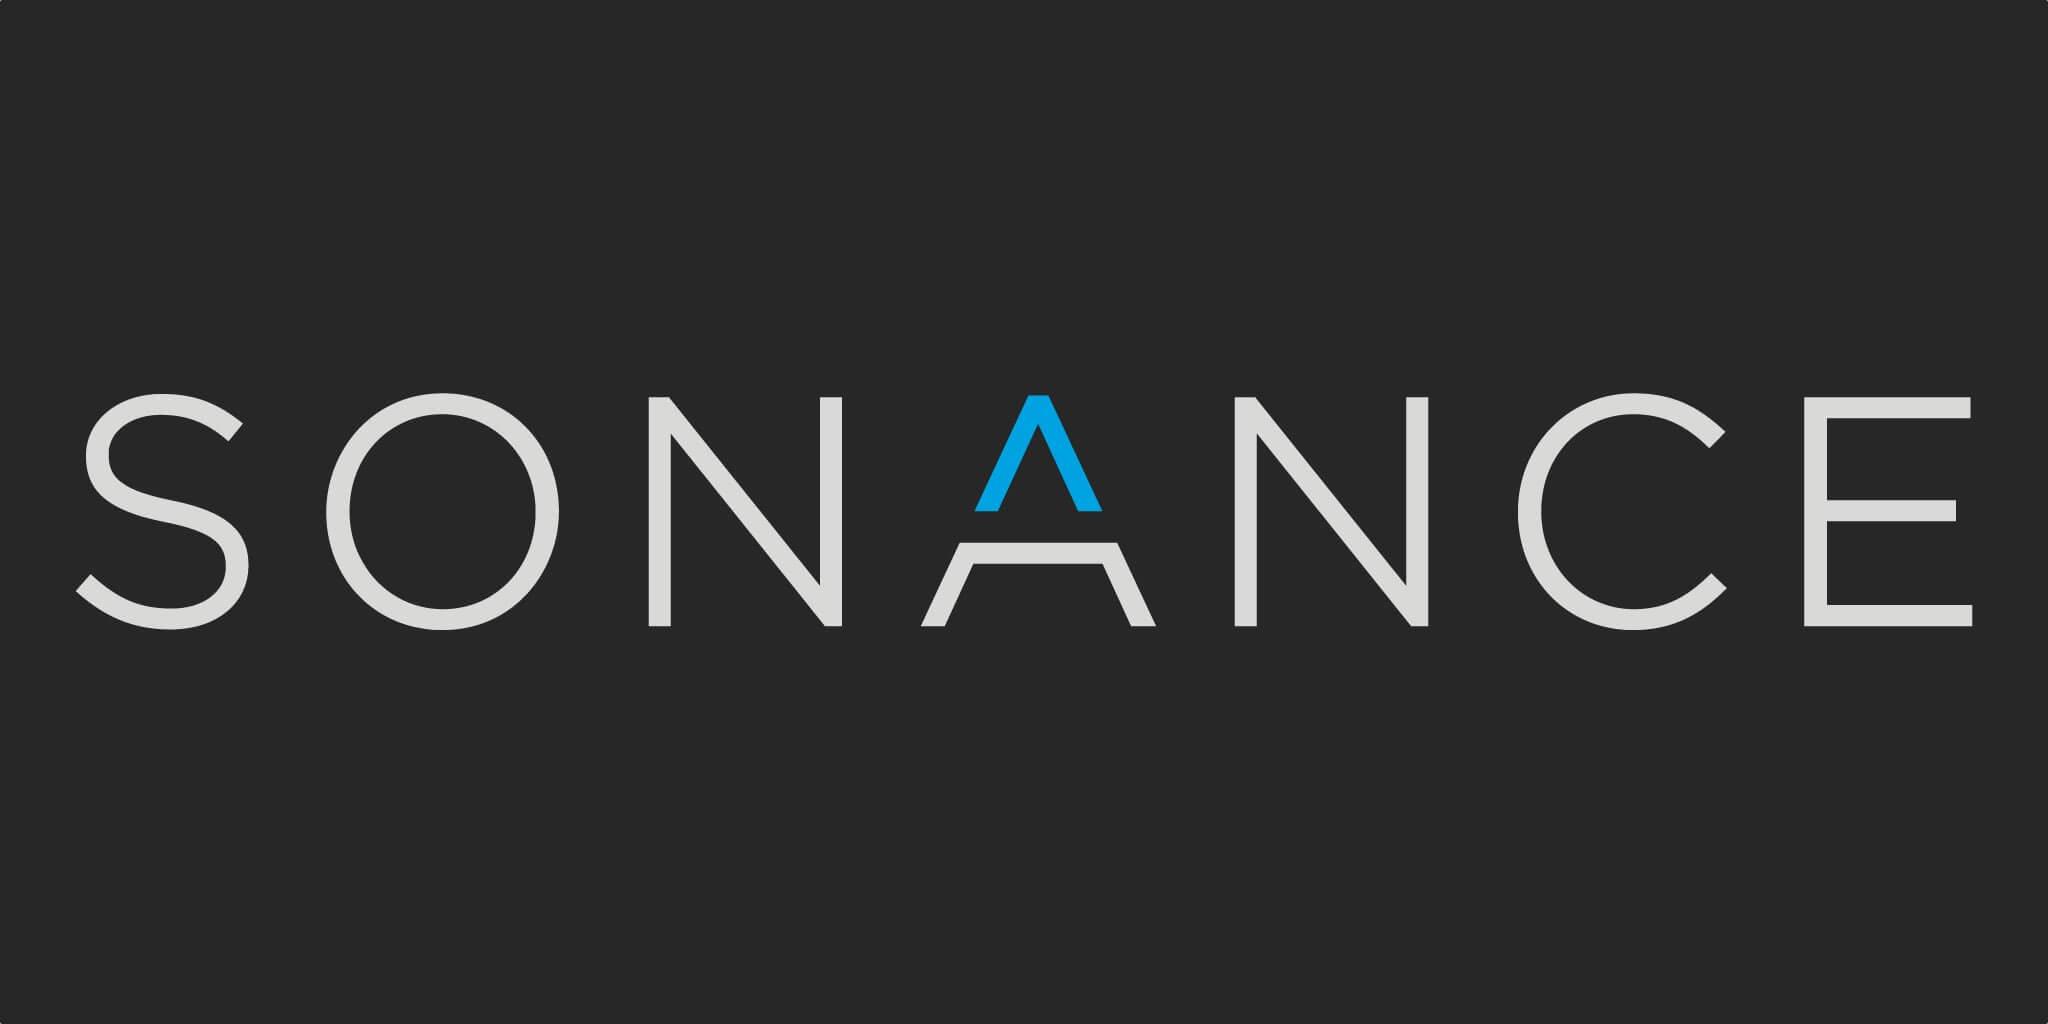 Sonance_Logo_2C_Dark_RGB_JPEG_2048x1024_60%